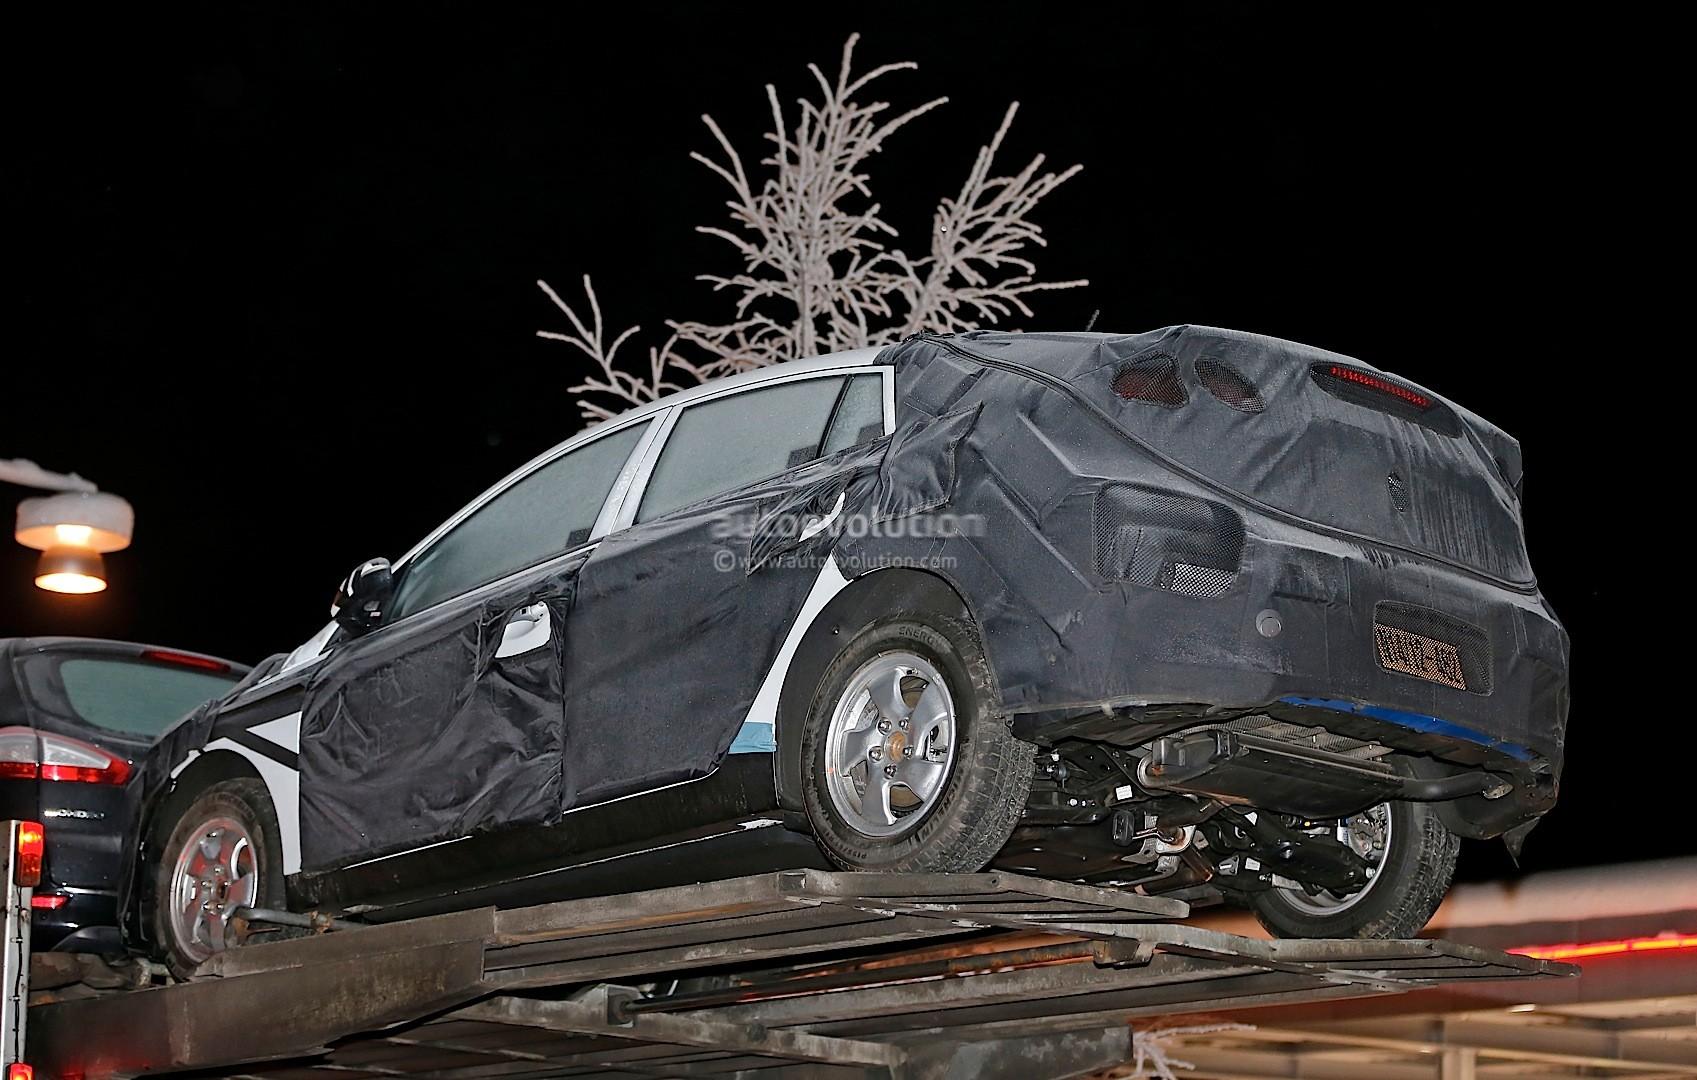 2016 - [Hyundai] Ioniq Hybrid-hyundai-elantra-like-prototype-spied-to-start-production-in-2016-photo-gallery_7